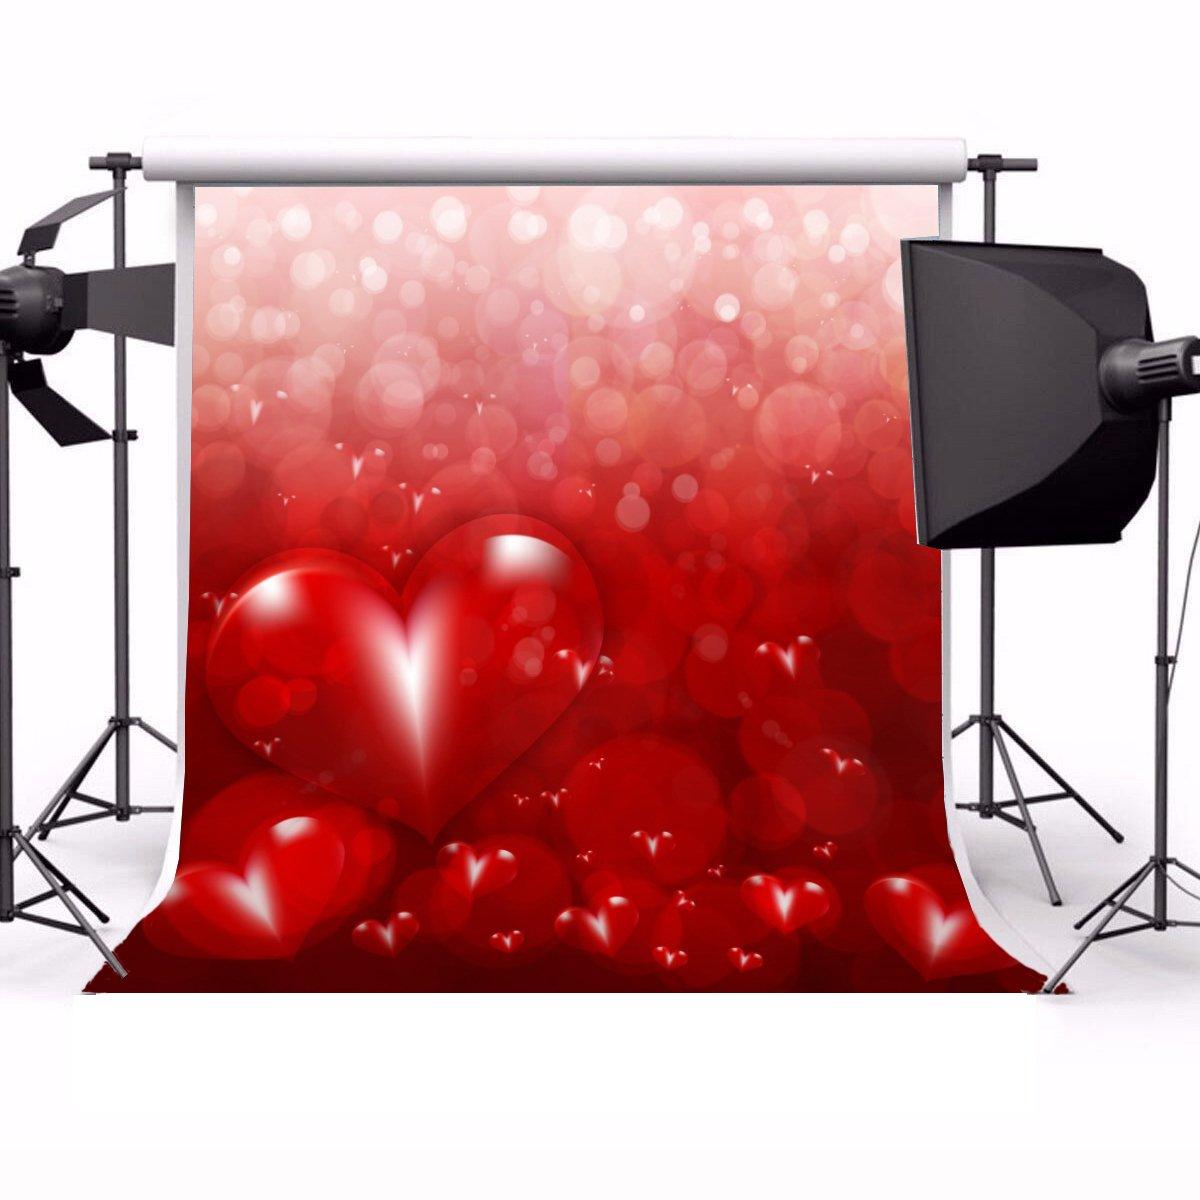 Amazoncom Laeacco 5x5ft Vinyl Photography Backdrop